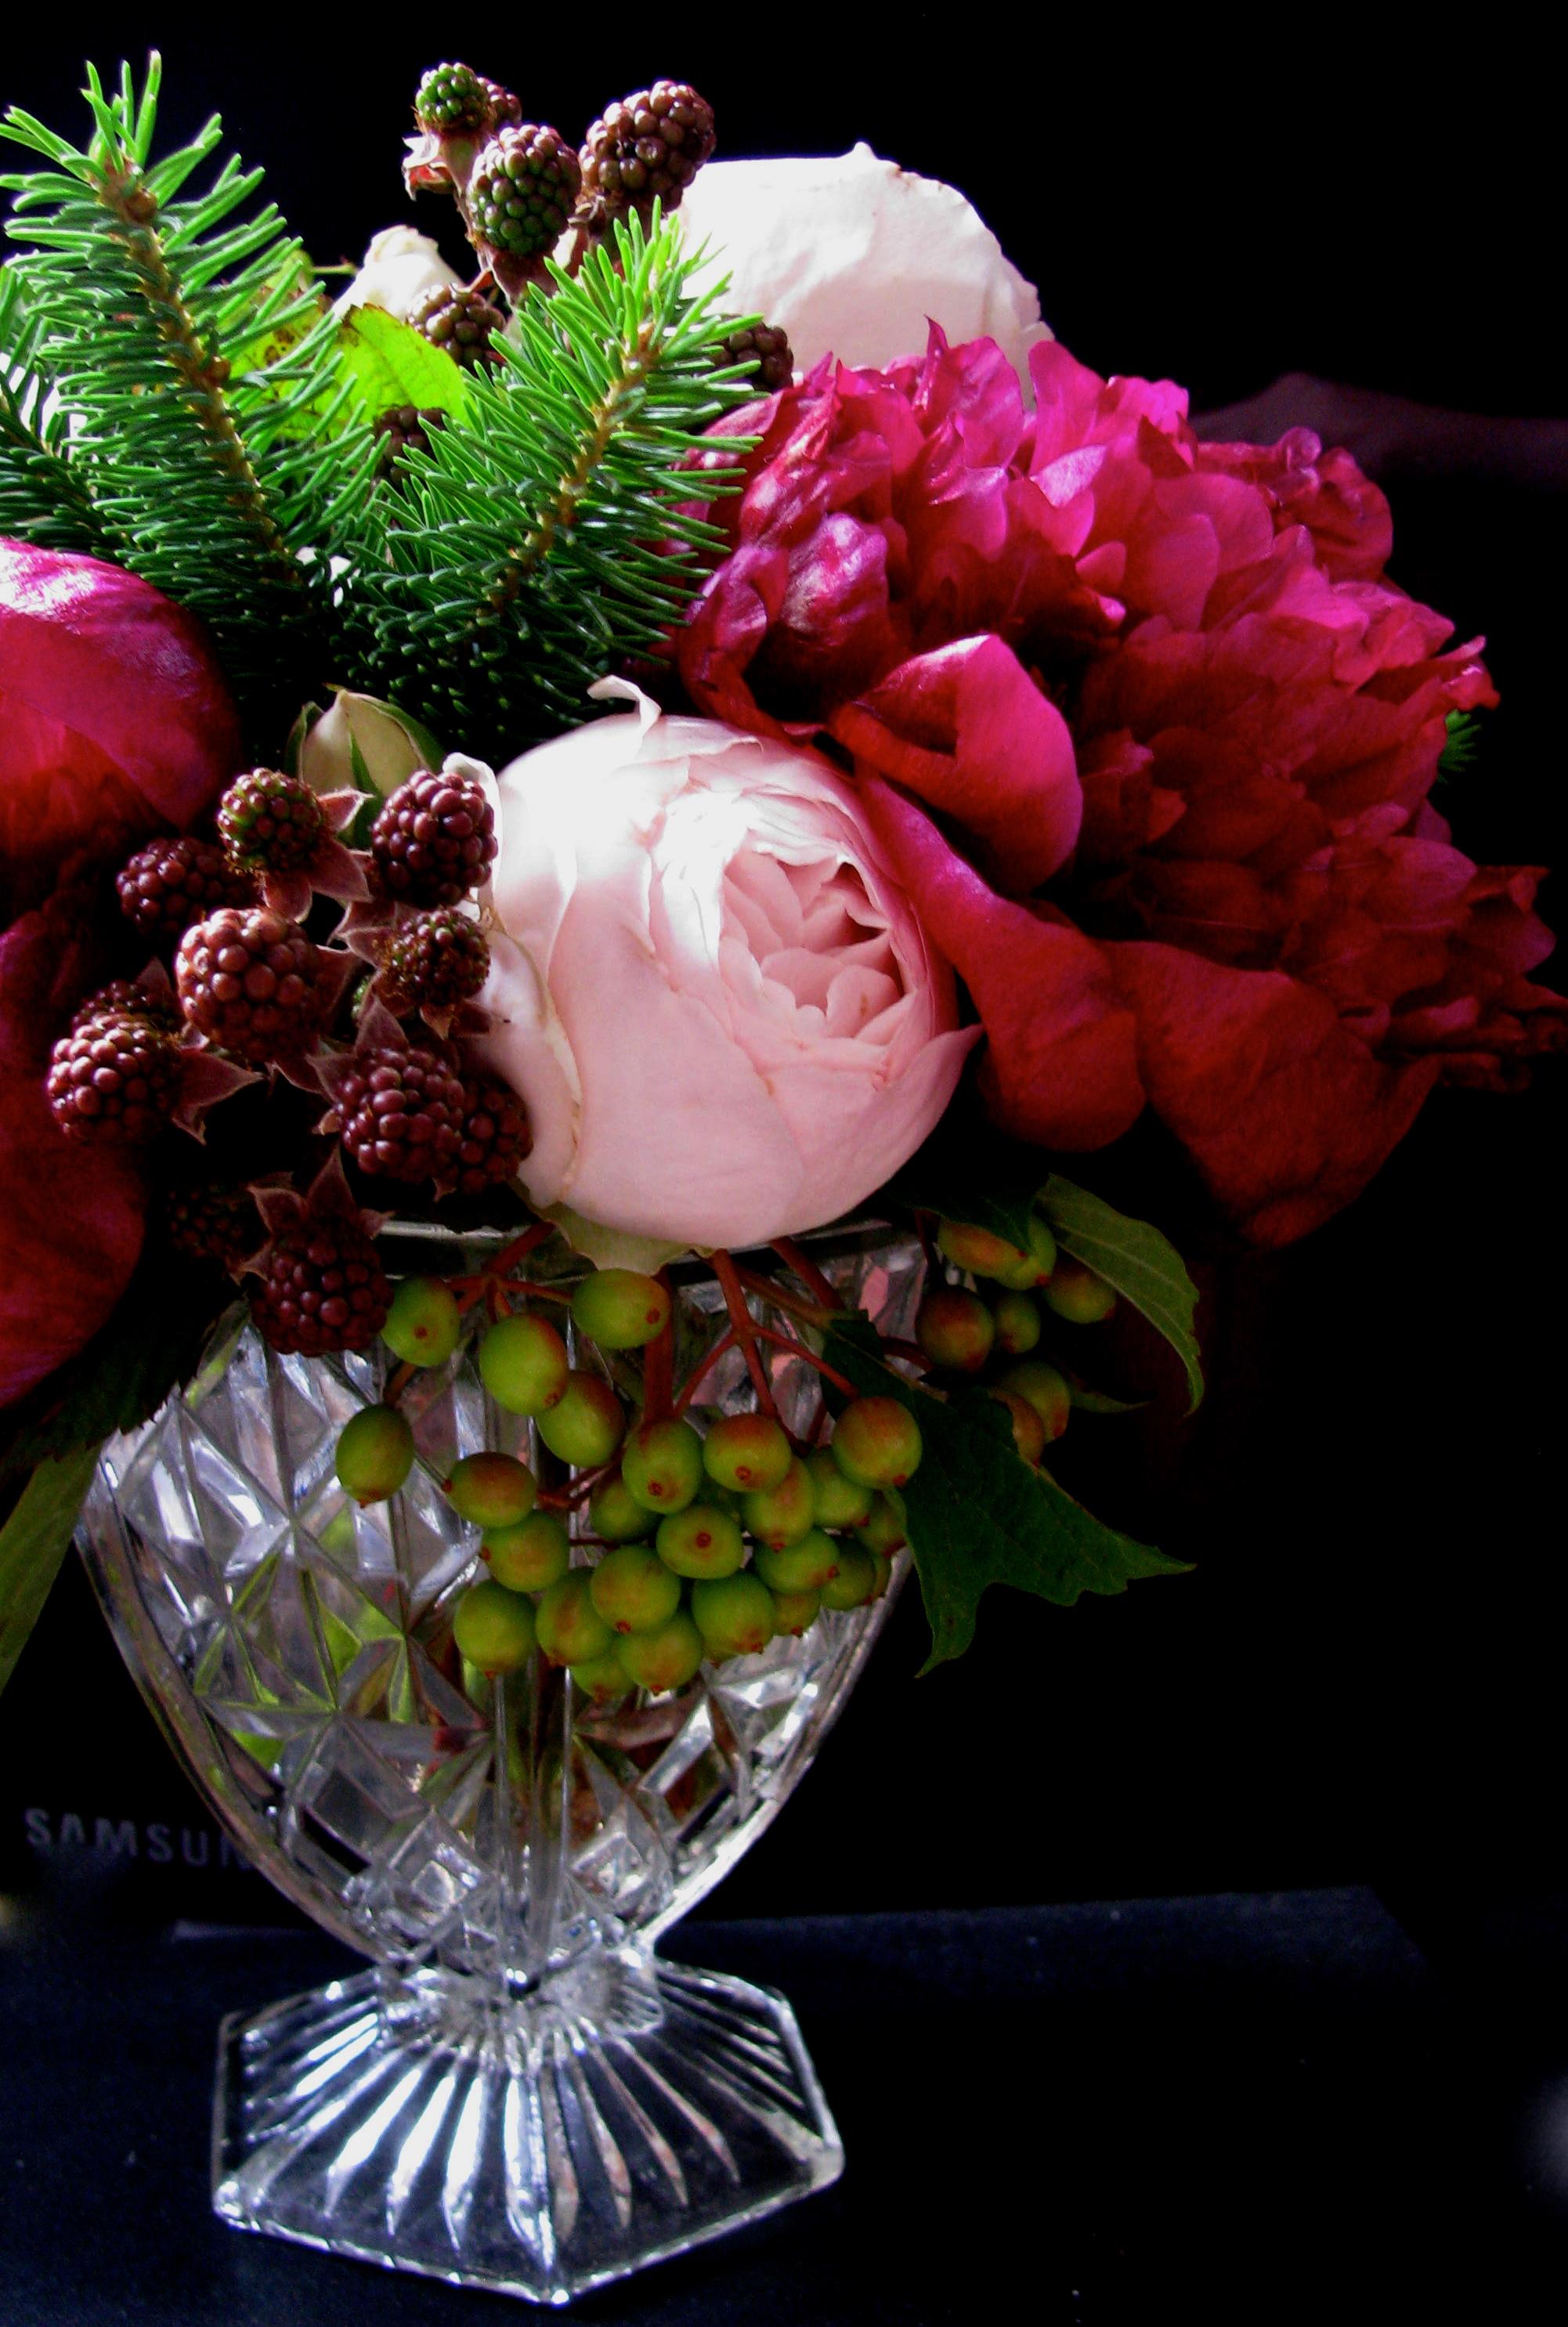 Festive arrangement